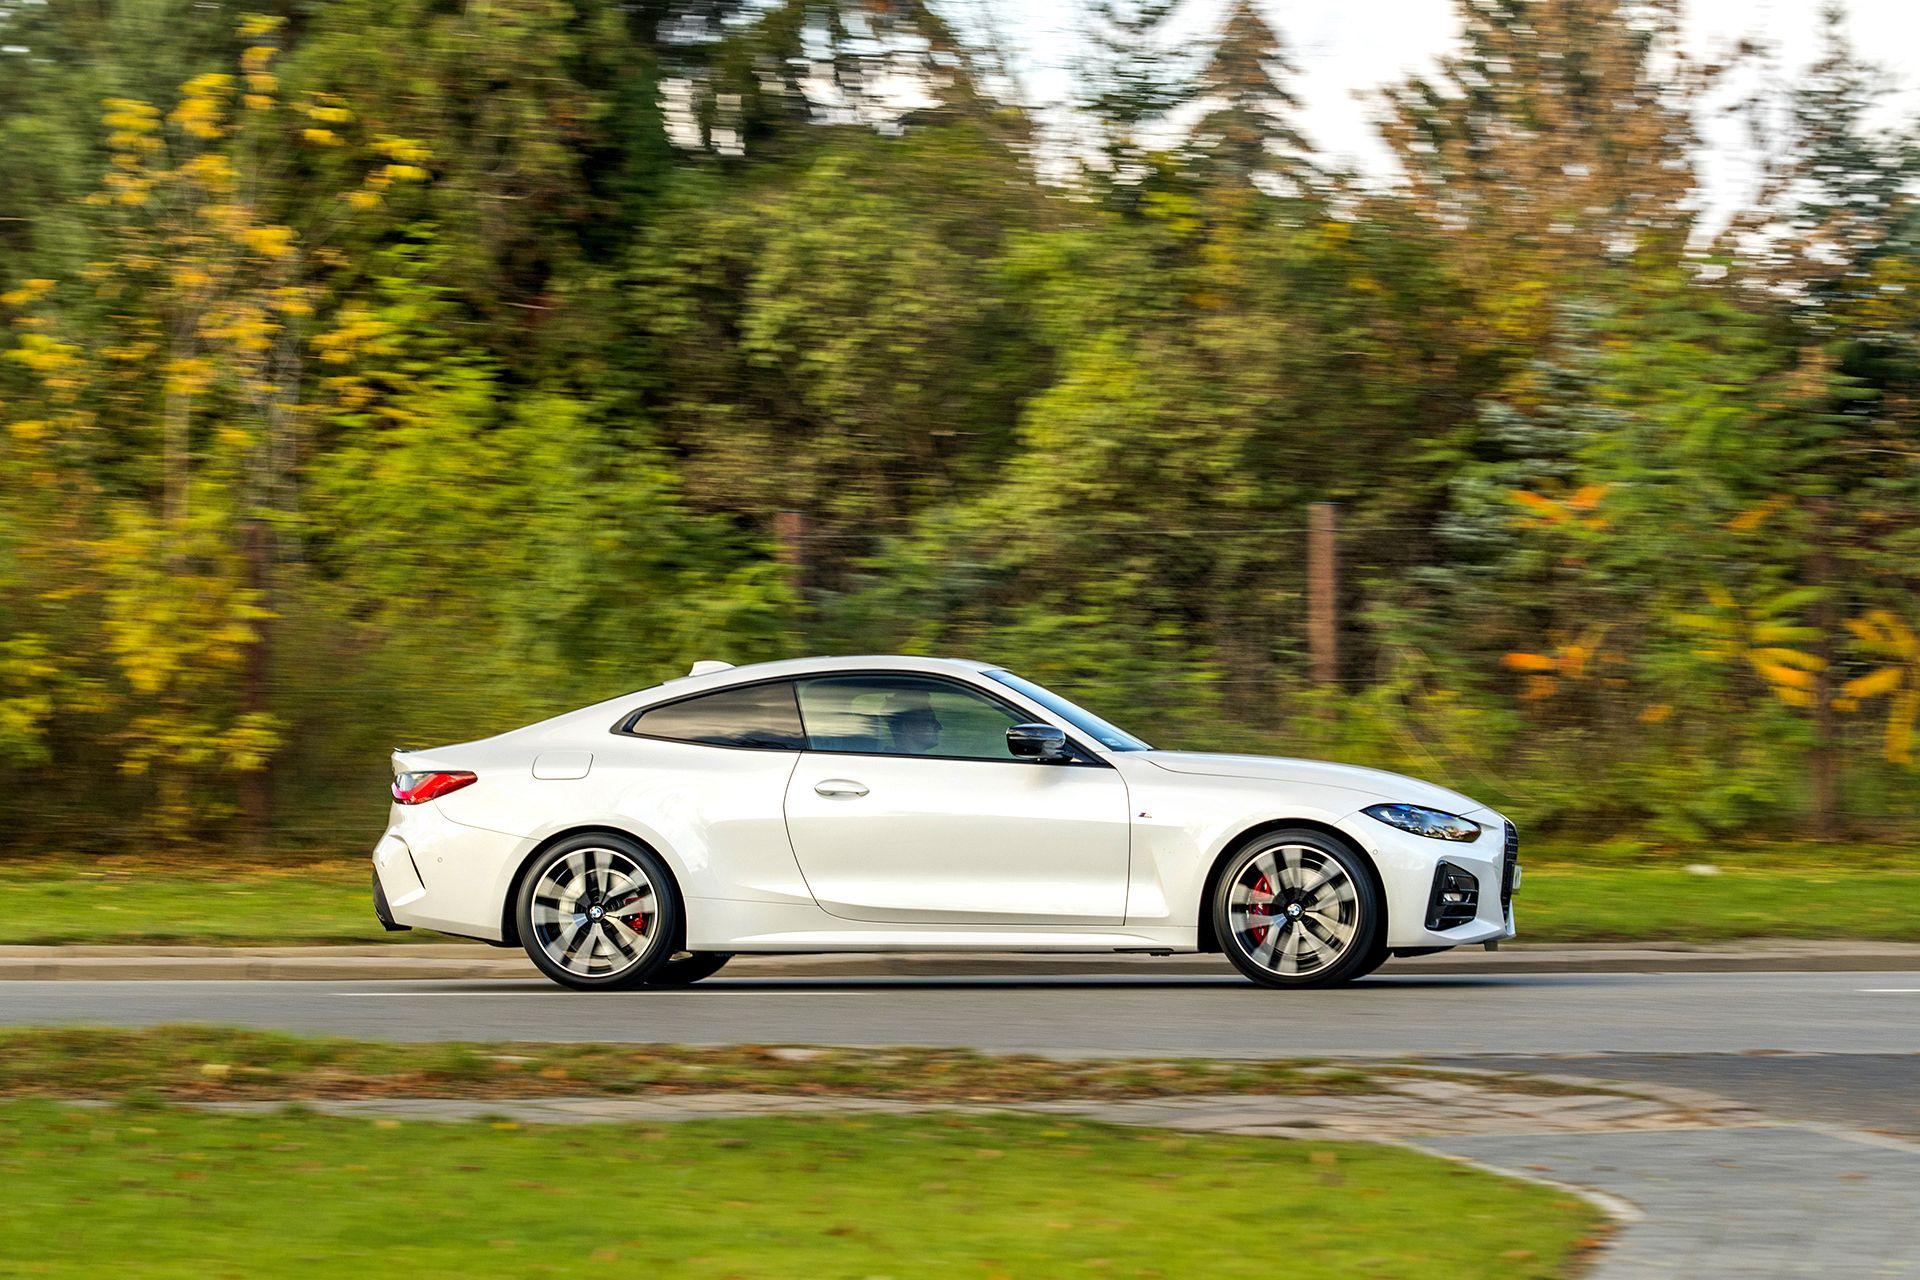 KSZ_BMW_430i_G22_DYNAMIKA_005